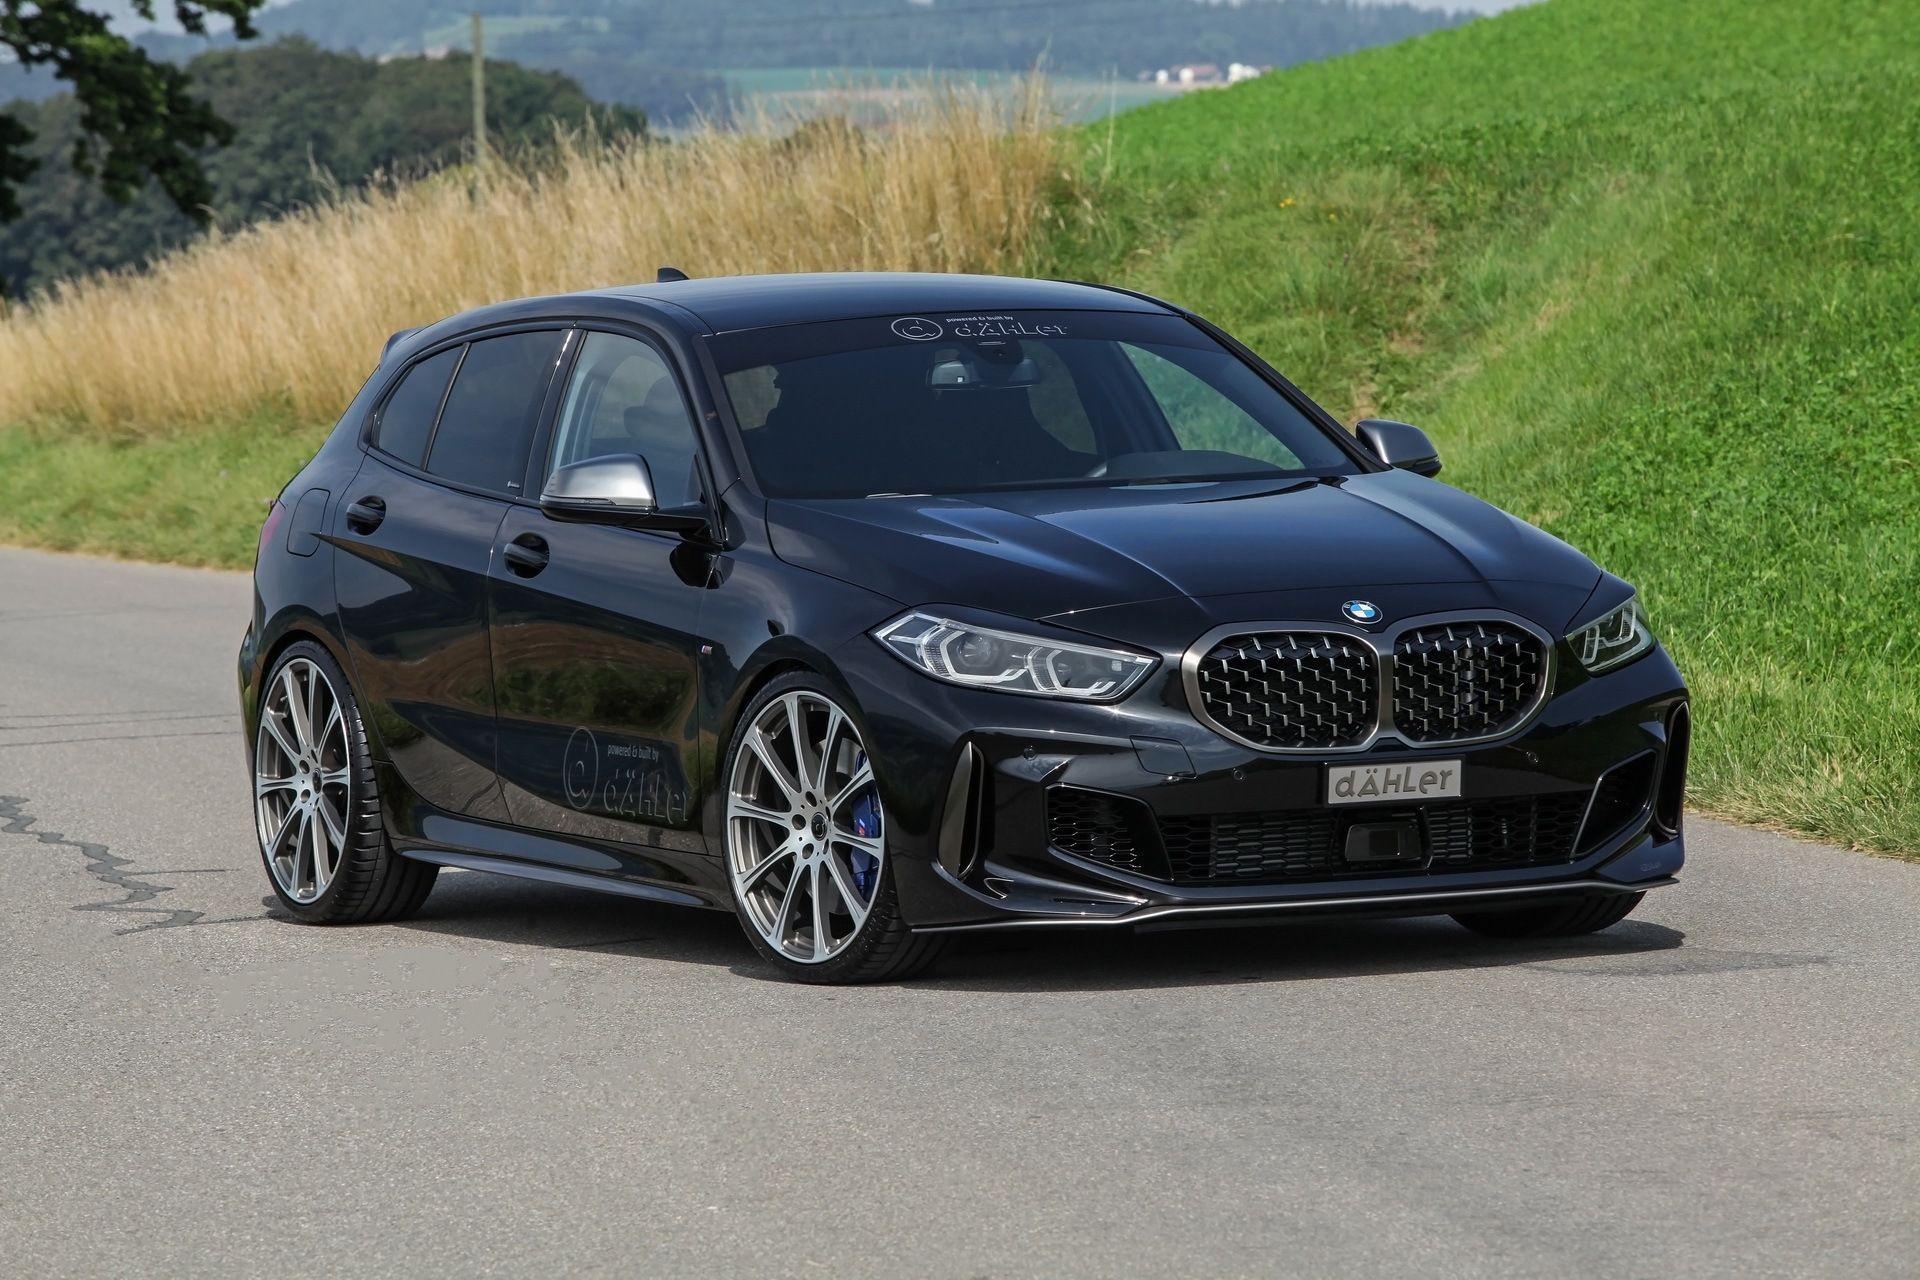 BMW_M135i_by_Dahler_0001